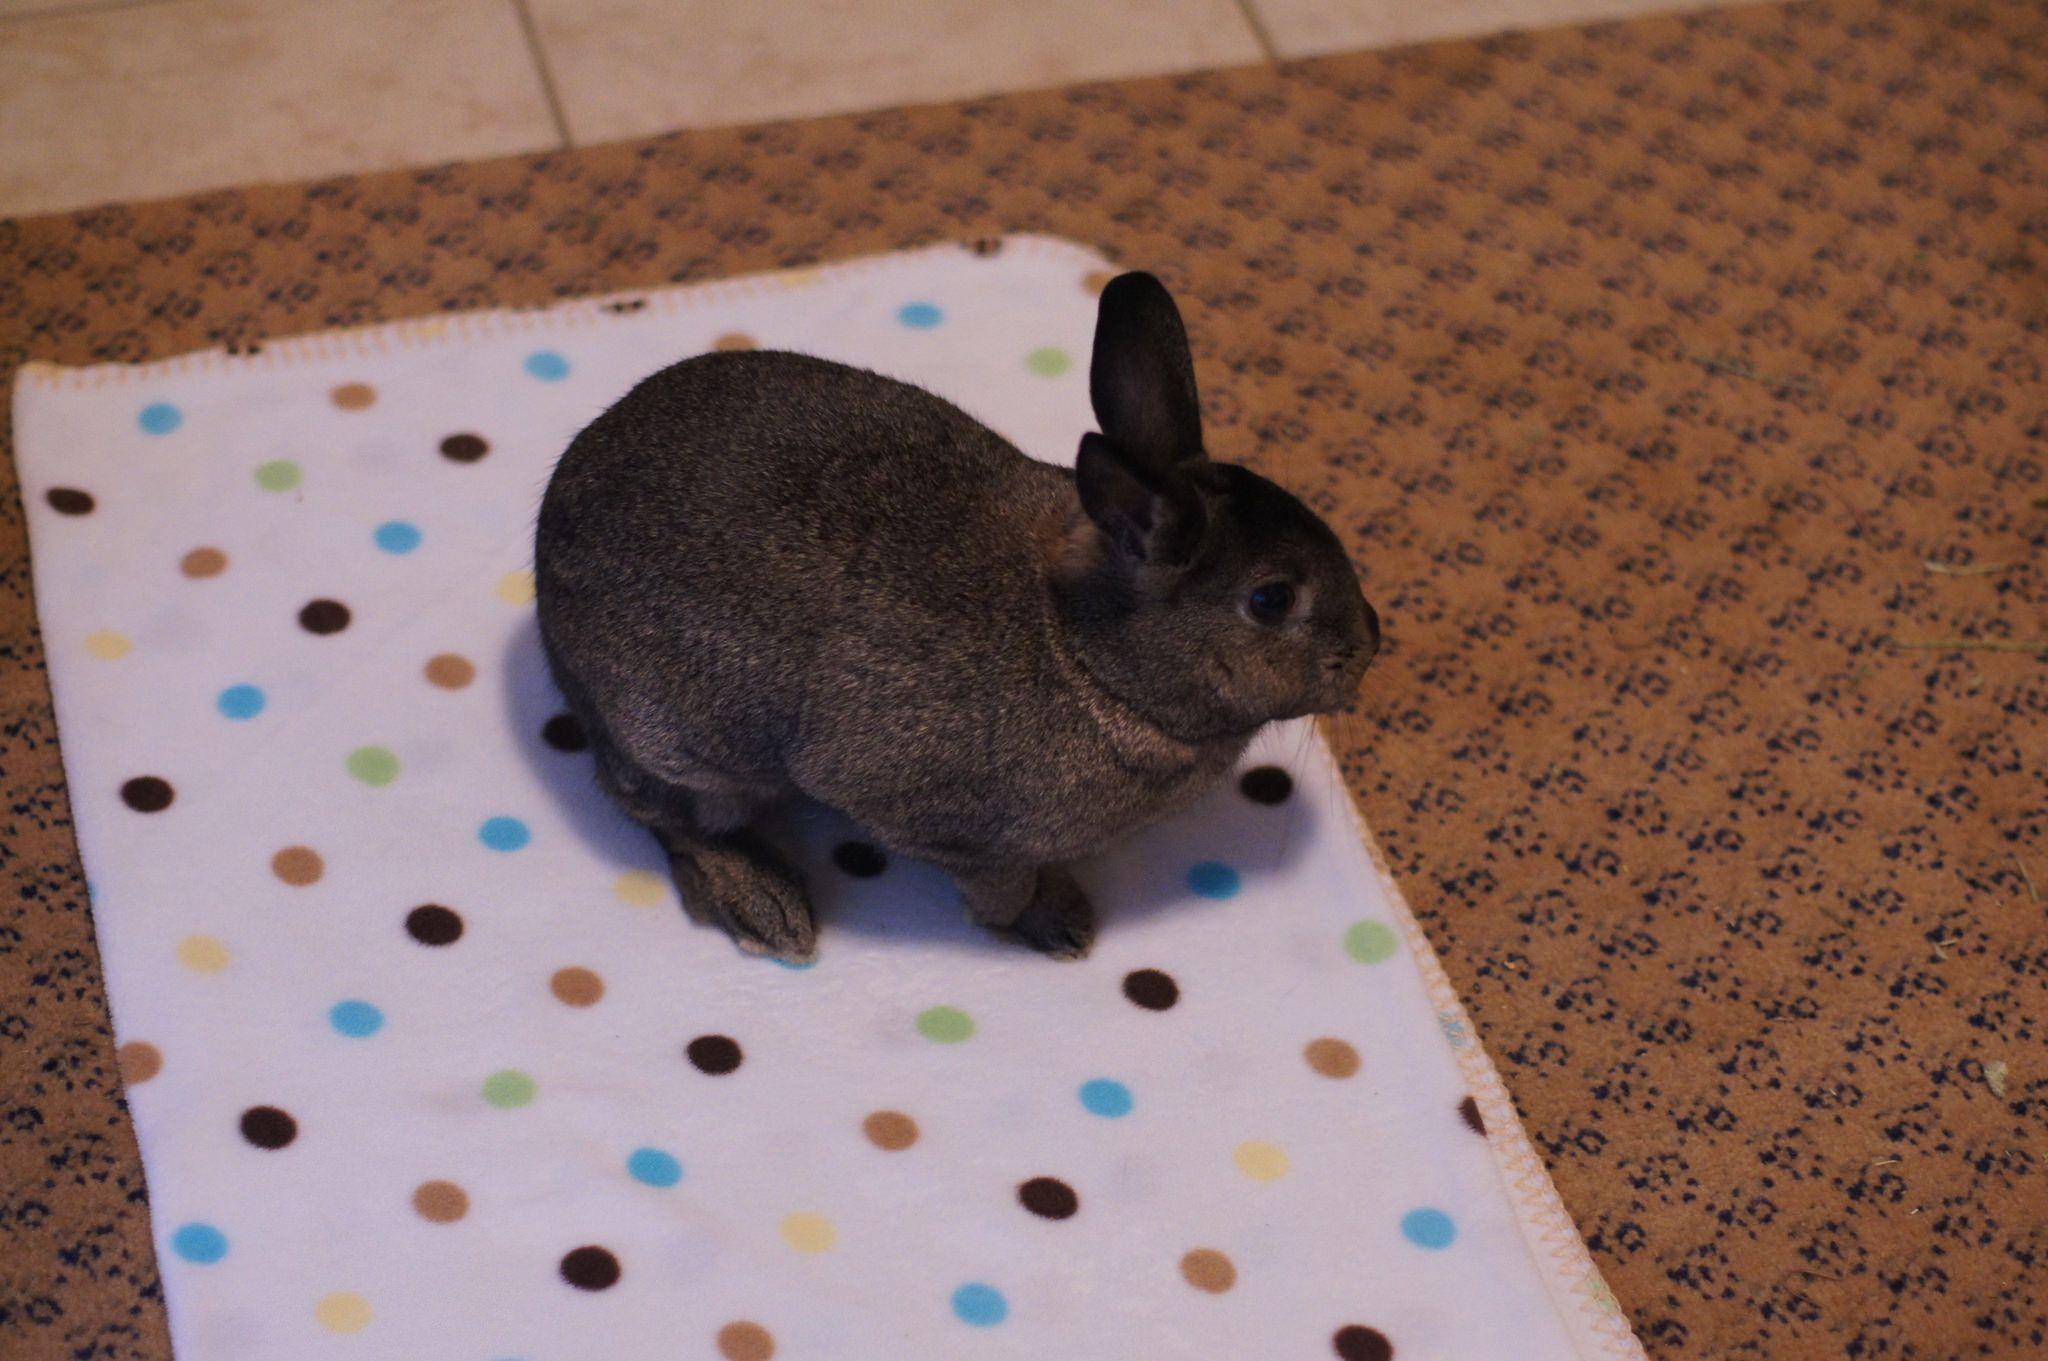 Sherman, little baby bunny